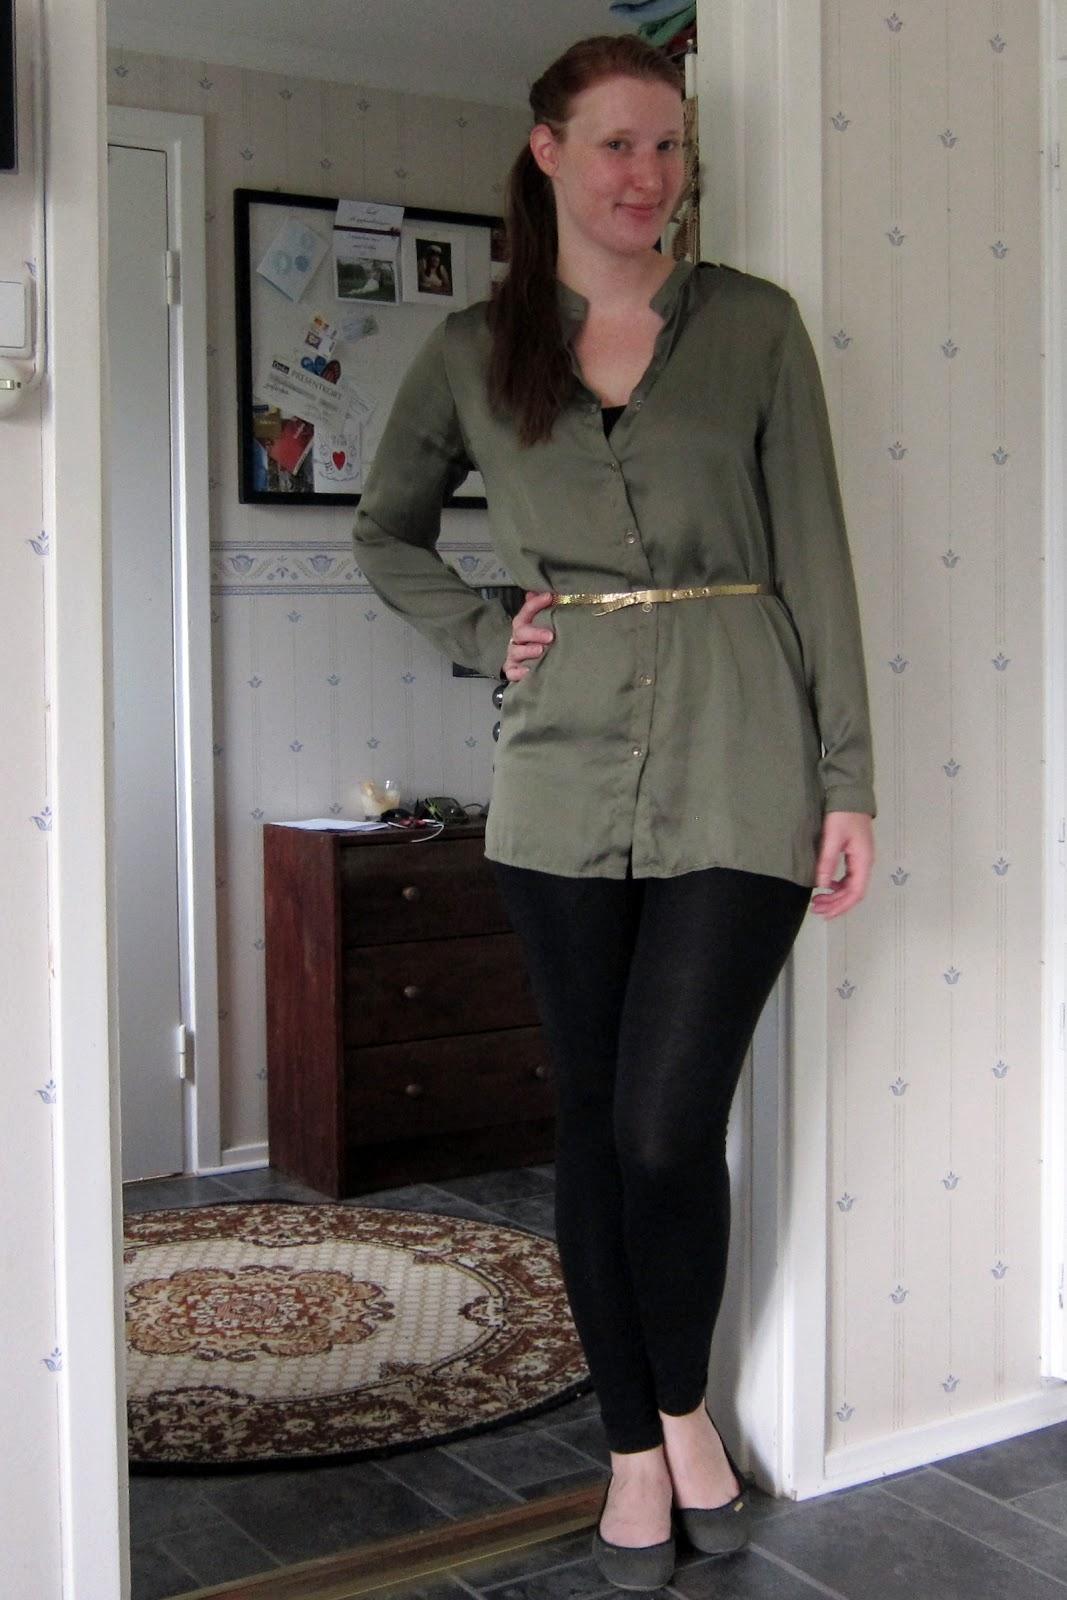 Ur min garderob: Tröttaste outfiten